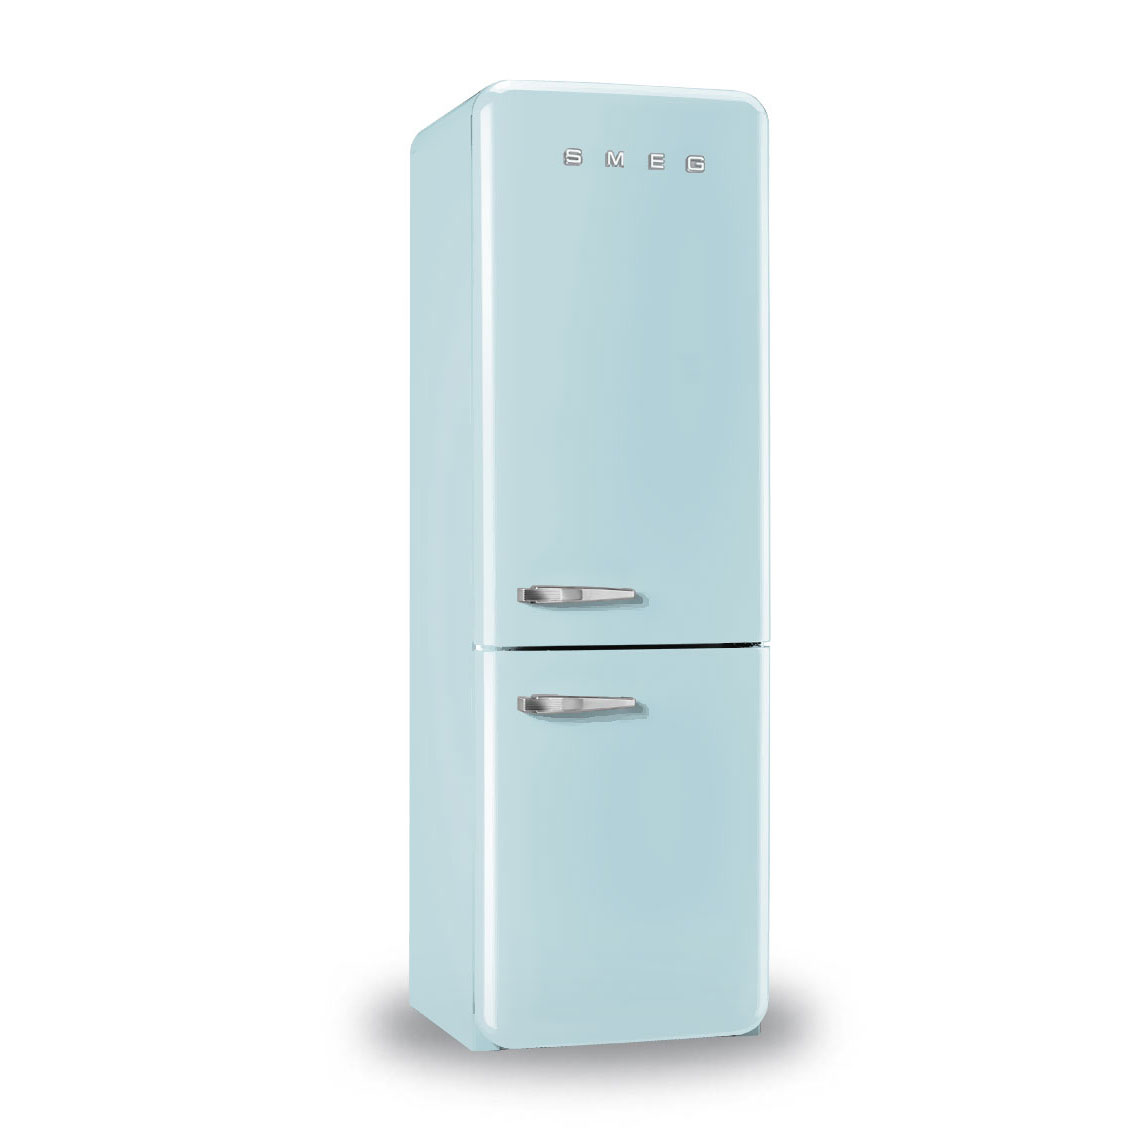 smeg fab32 right hinged refrigeration. Black Bedroom Furniture Sets. Home Design Ideas